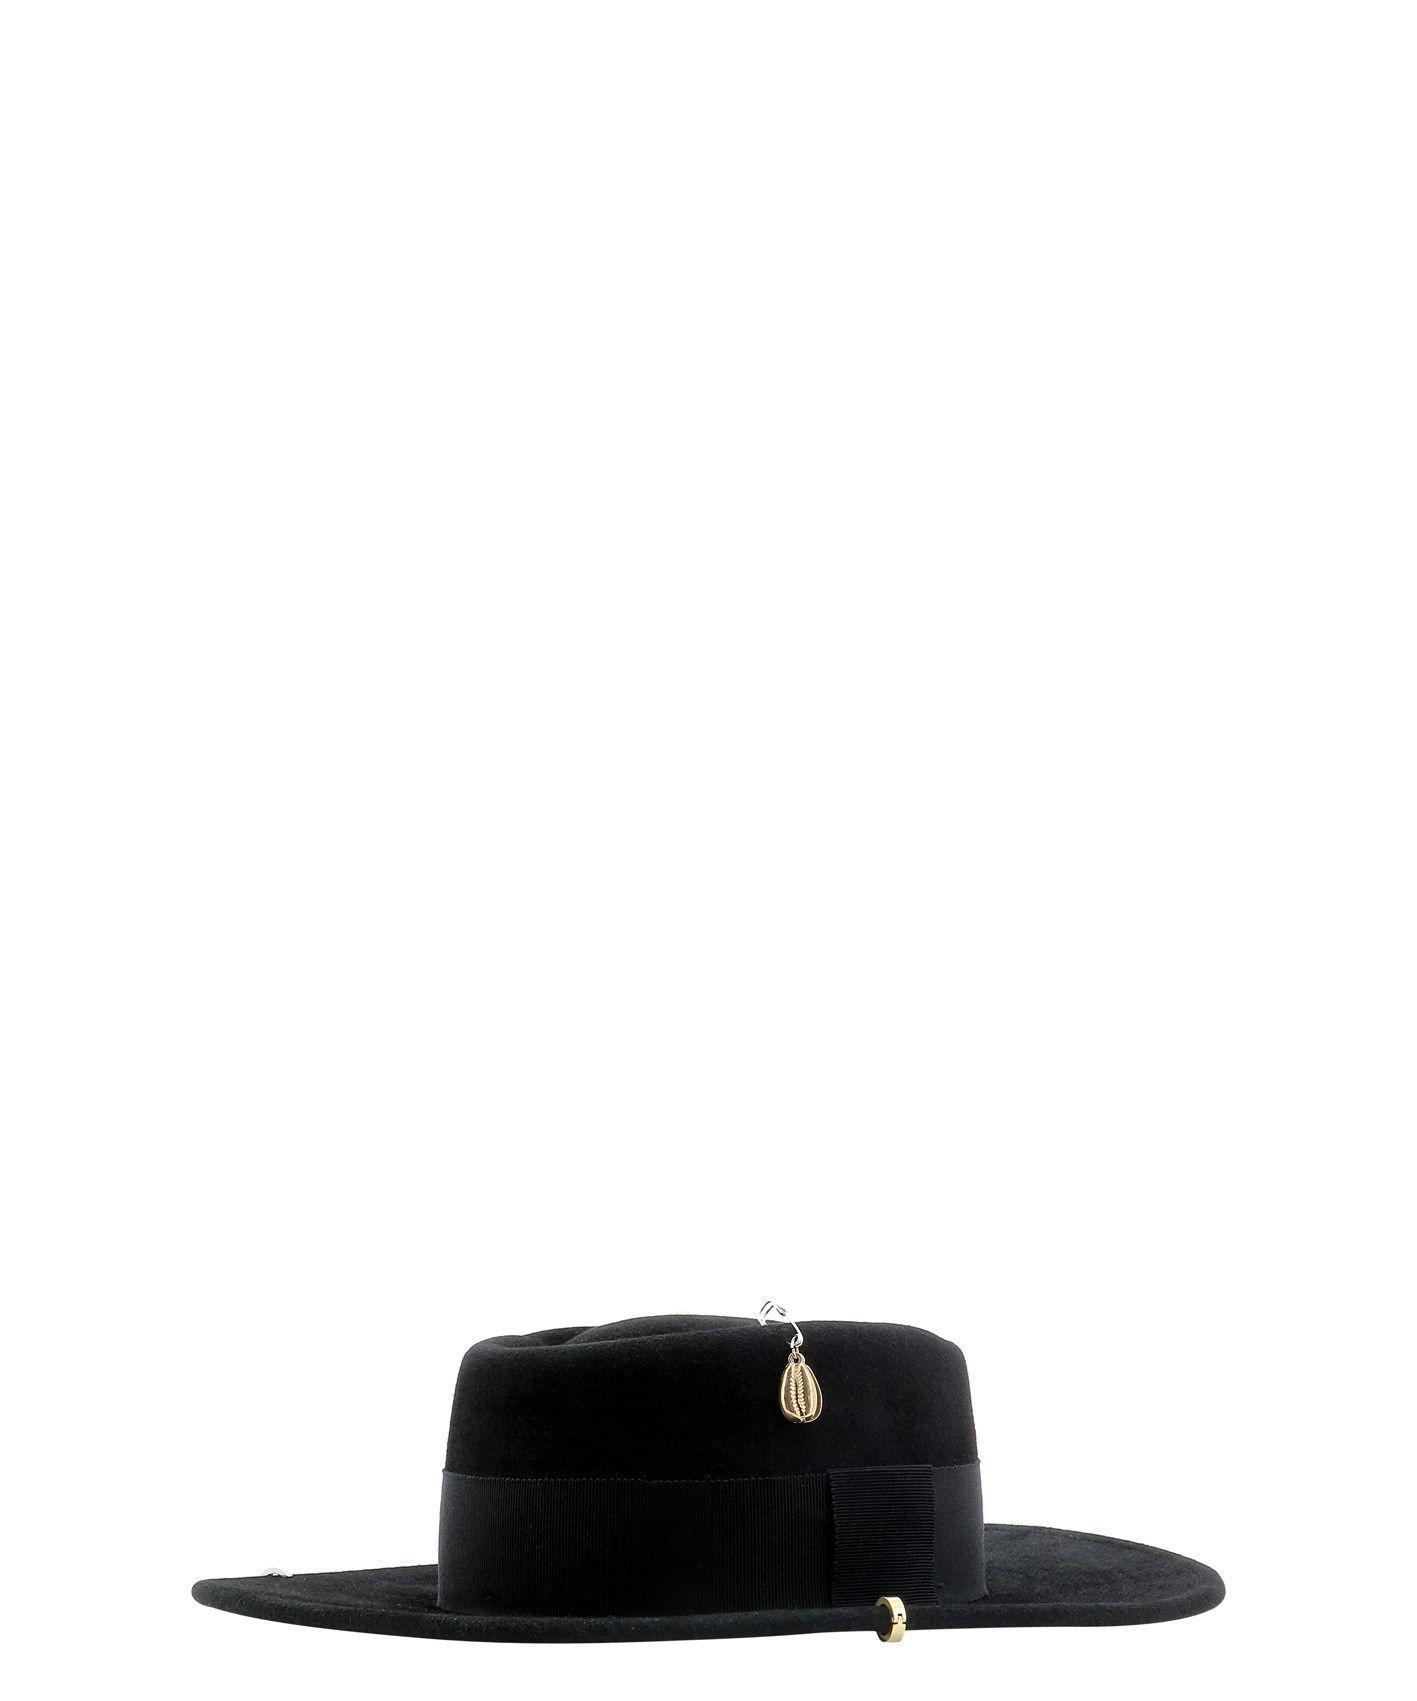 RUSLAN BAGINSKIY Hats RUSLAN BAGINSKIY WOMEN'S BLACK FABRIC HAT